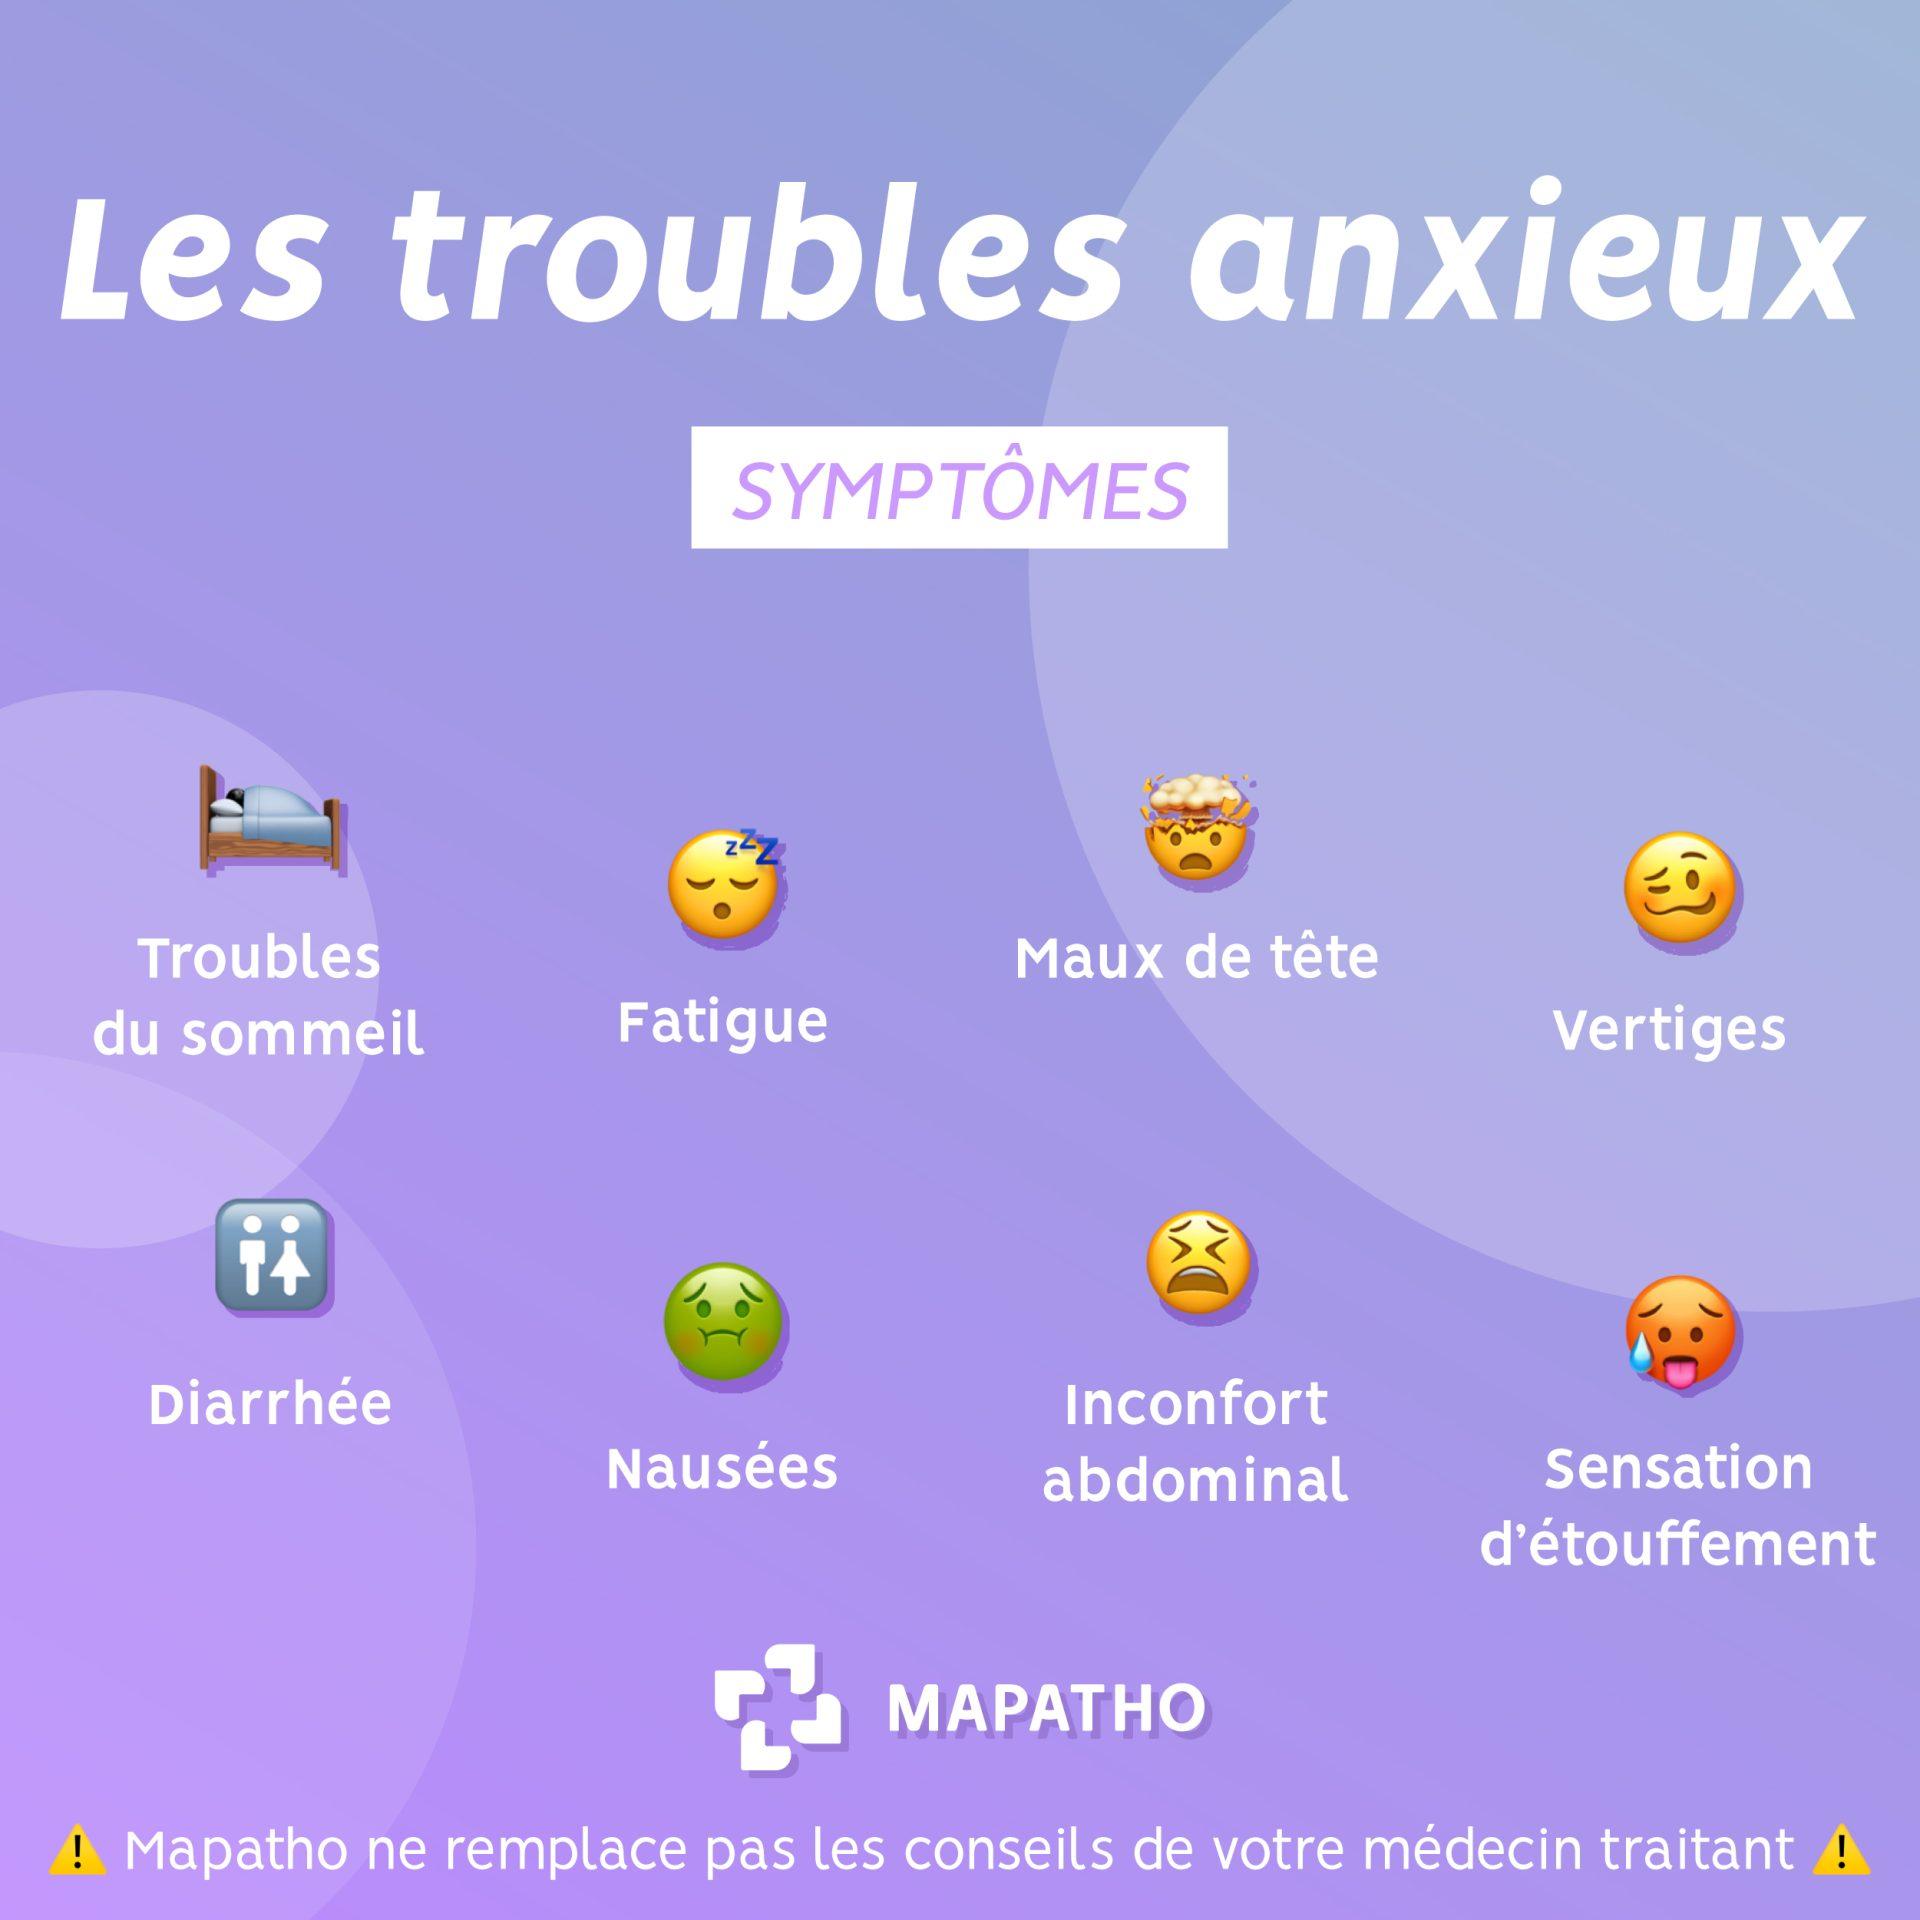 Les symptomes troubles anxieux